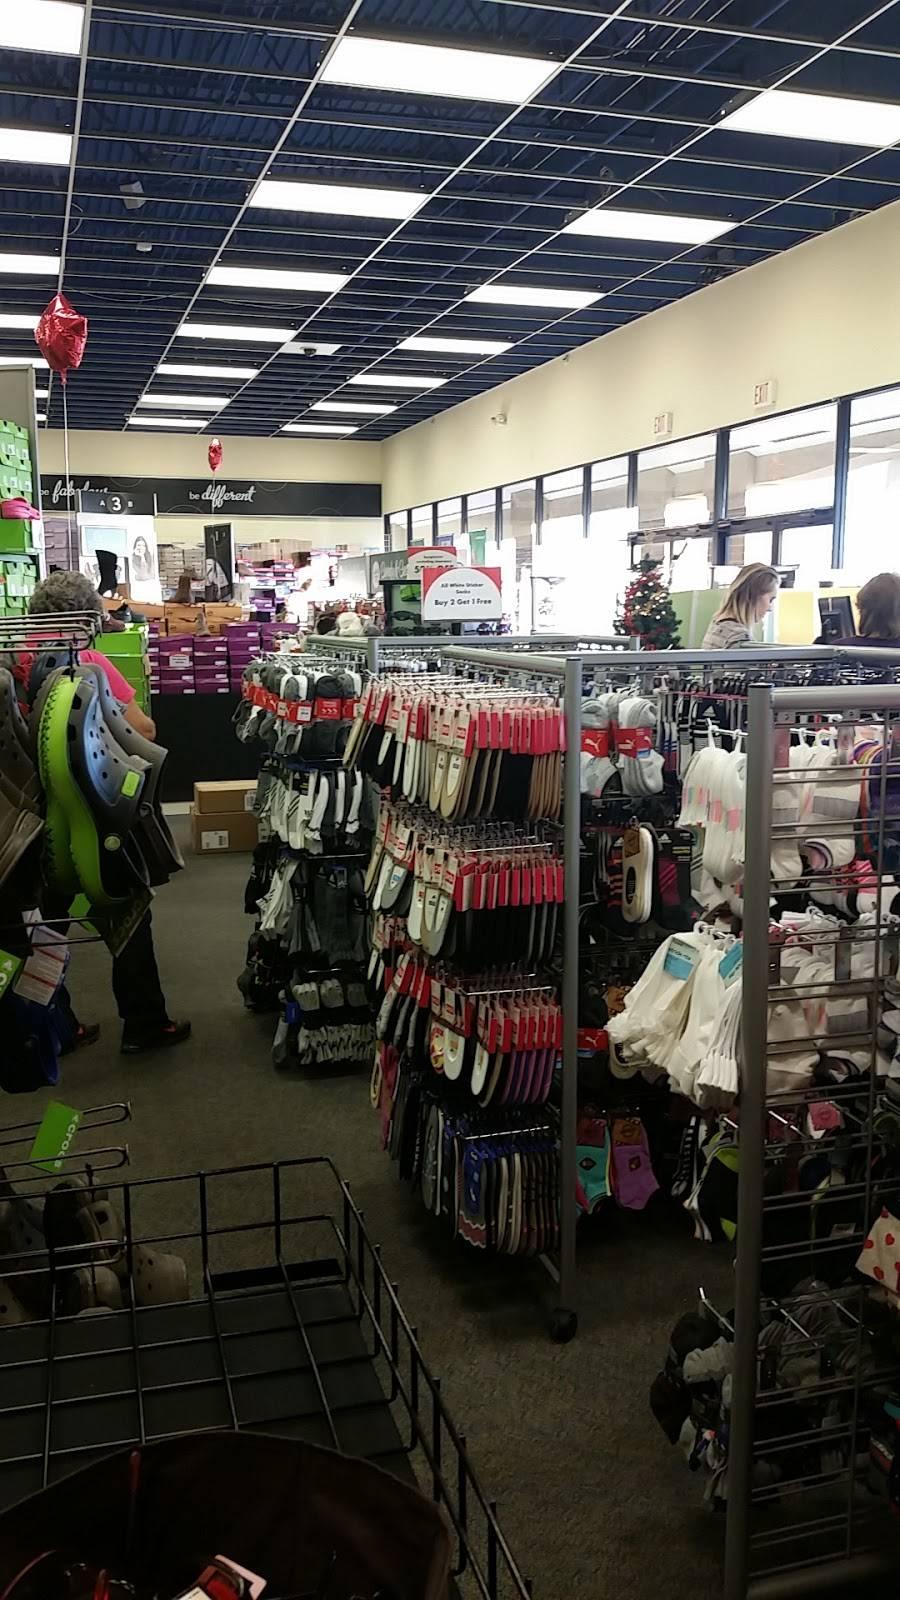 Shoe Carnival - shoe store  | Photo 3 of 8 | Address: 12313 E 96th St N, Owasso, OK 74055, USA | Phone: (918) 376-2918